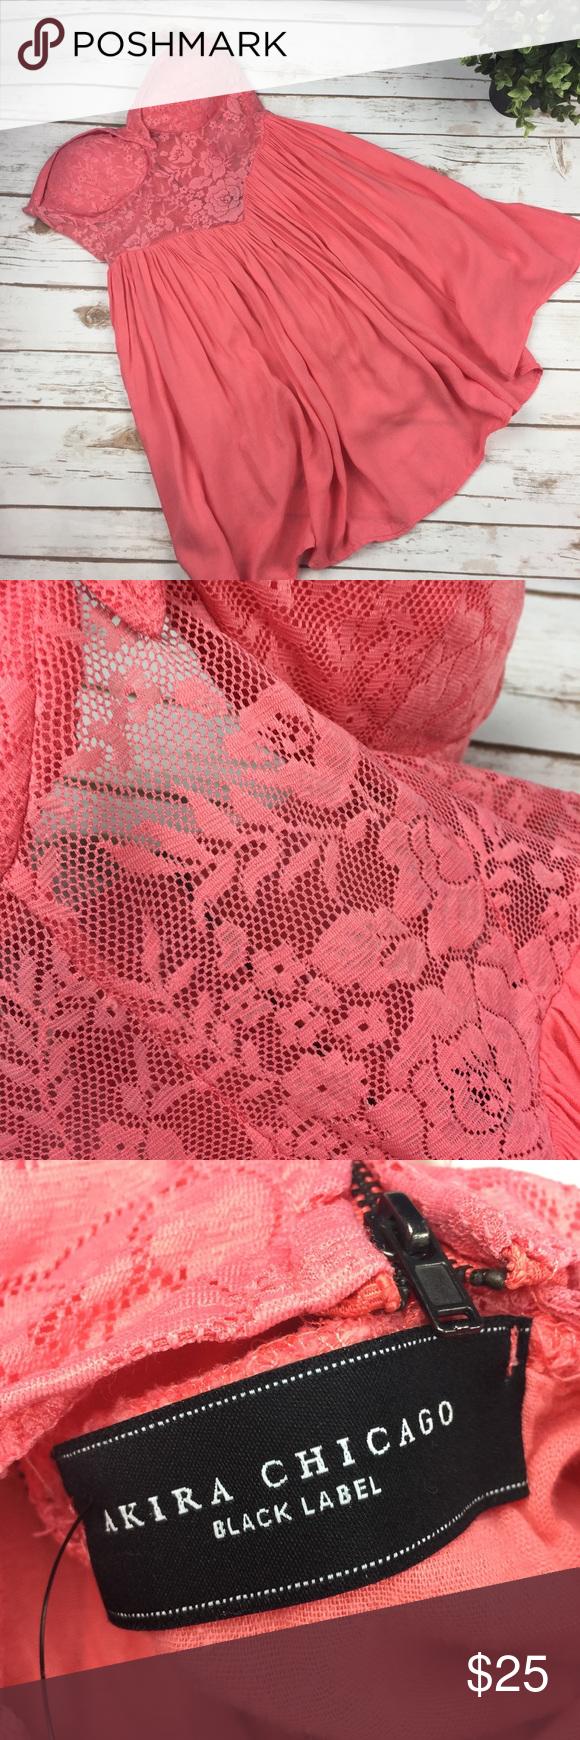 Pink see through lace dress  Akira Chicago pink strapless dress see thru bodice  Akira chicago